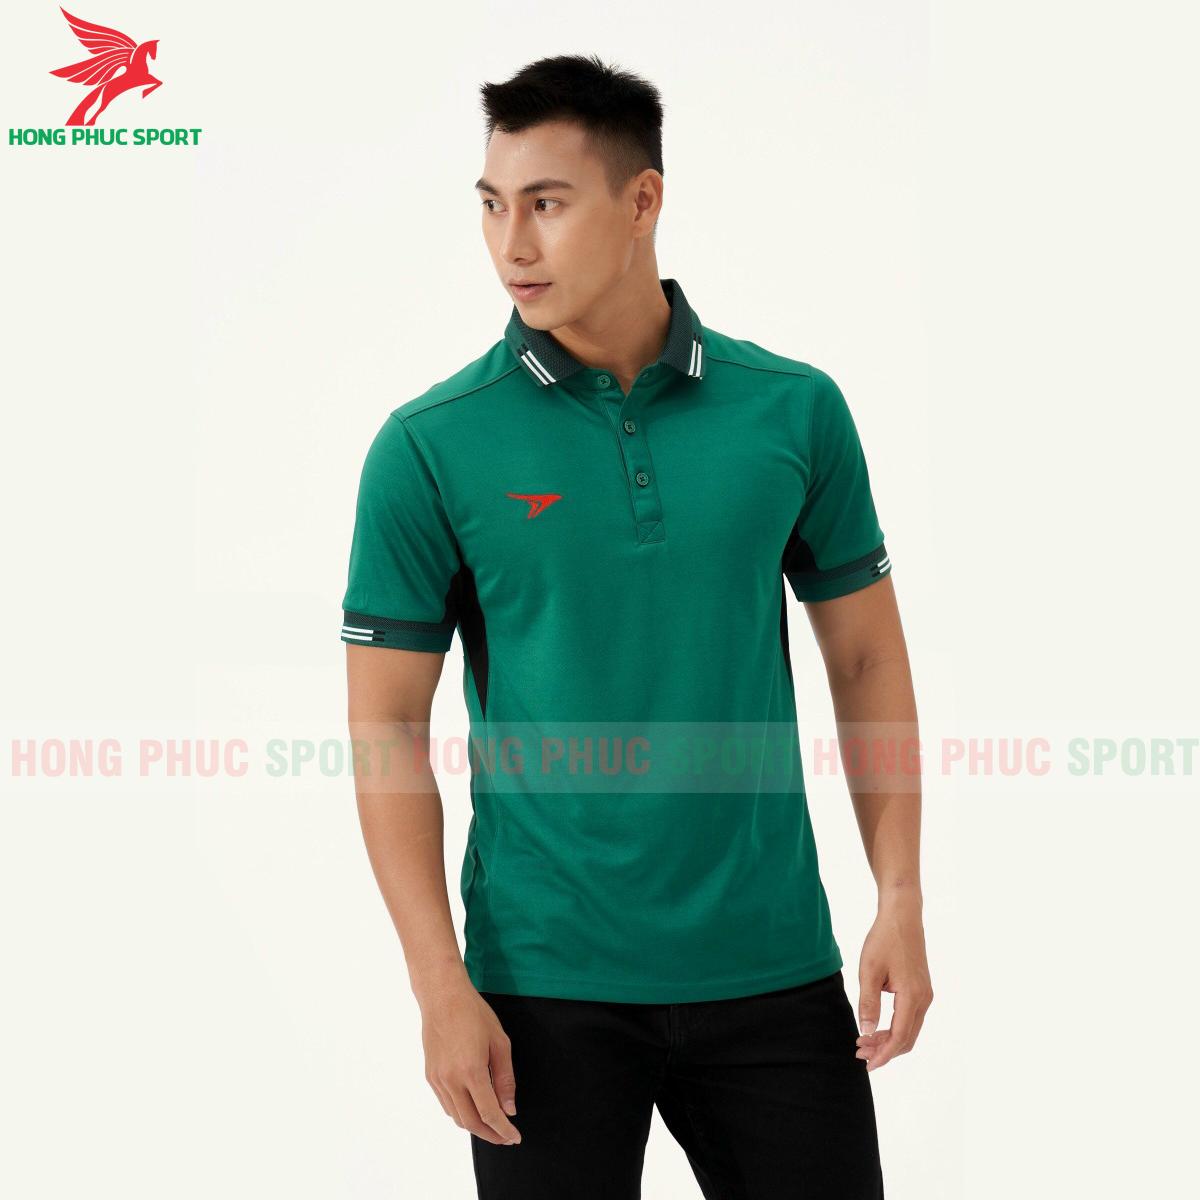 https://cdn.hongphucsport.com/unsafe/s4.shopbay.vn/files/285/ao-polo-beyono-power-2021-mau-xanh-la-2-609de7a2668ef.png